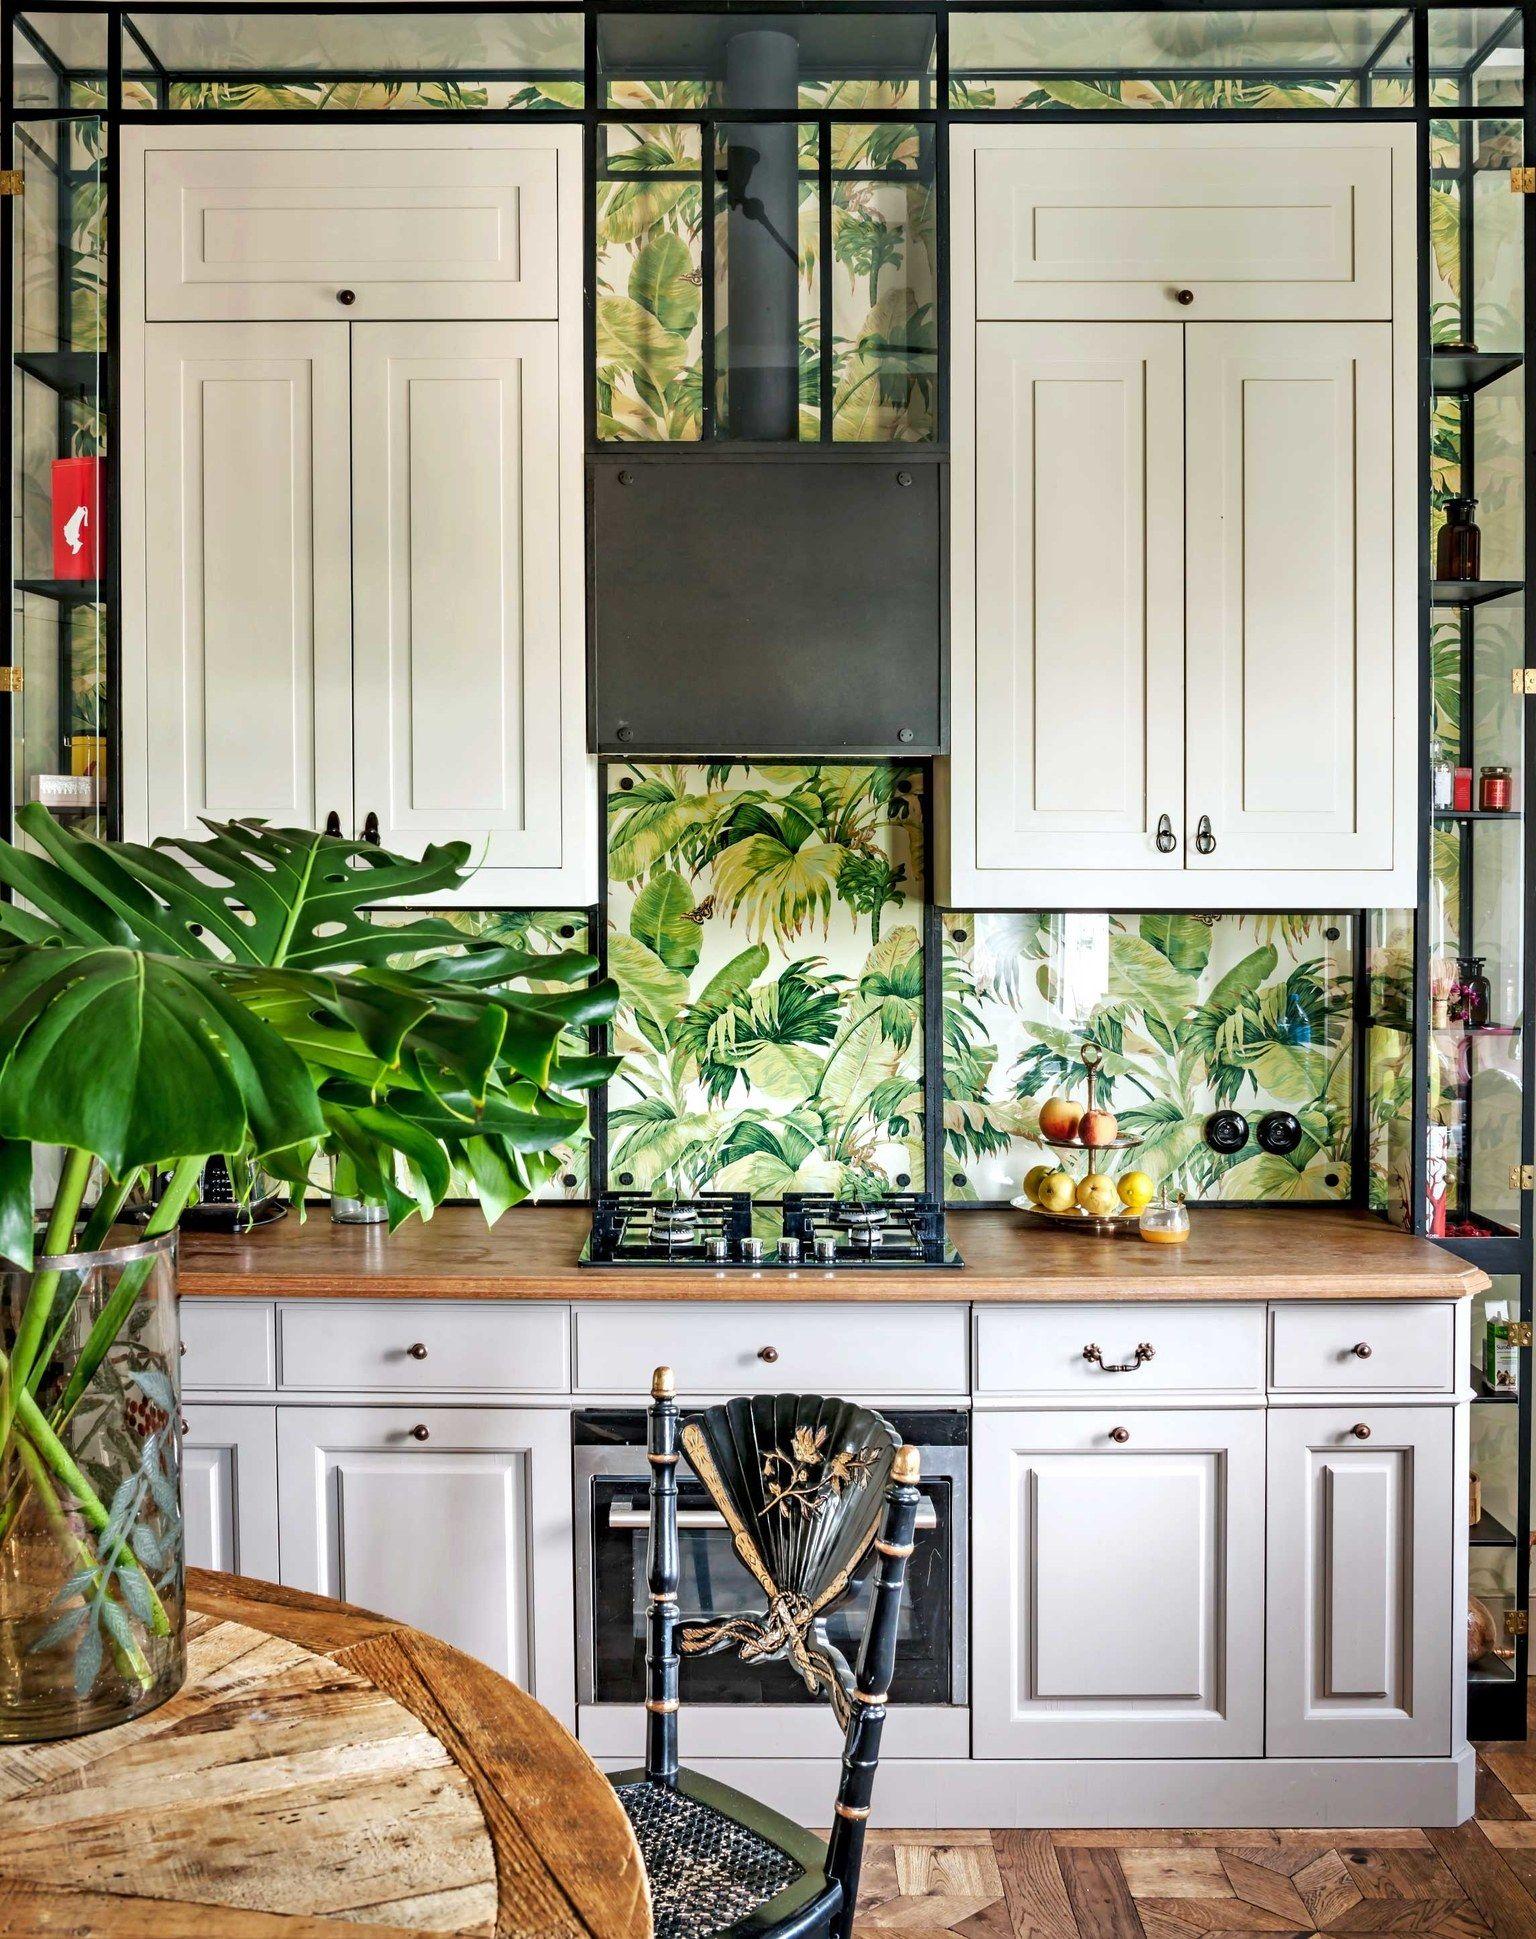 Kitchen Backsplash Ideas That Aren t Tile